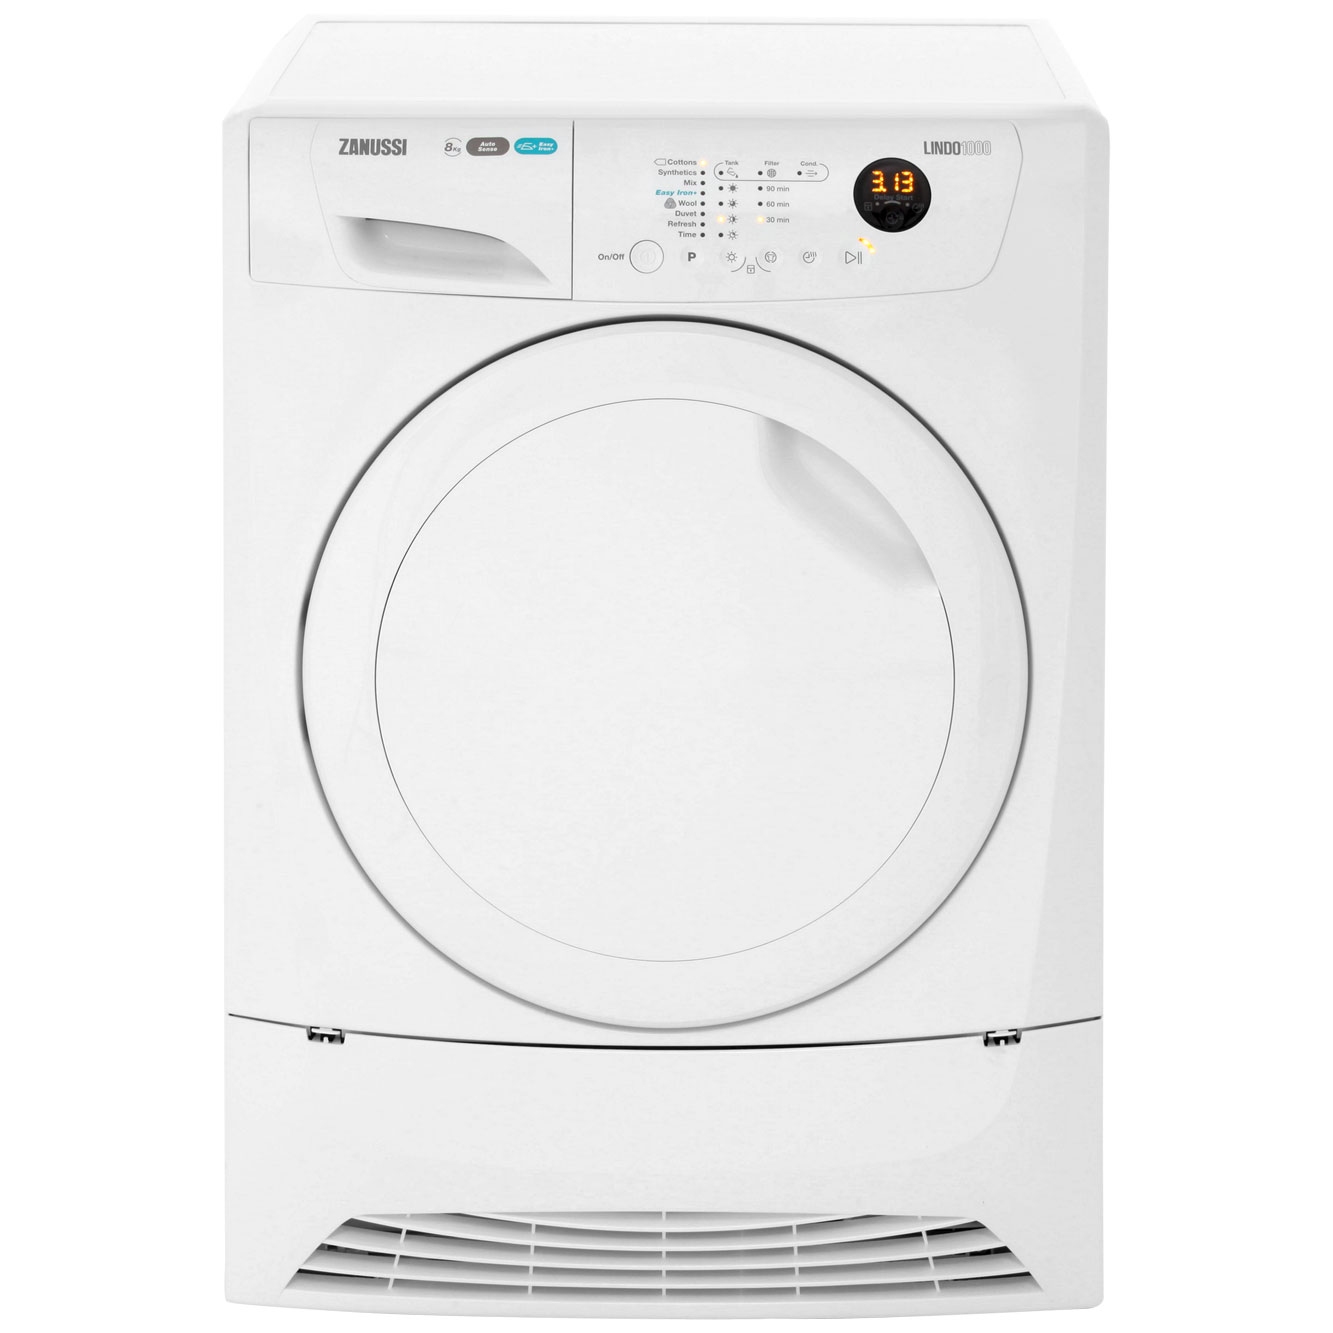 Zanussi Lindo1000 ZDH8333PZ Free Standing Condenser Tumble Dryer in White